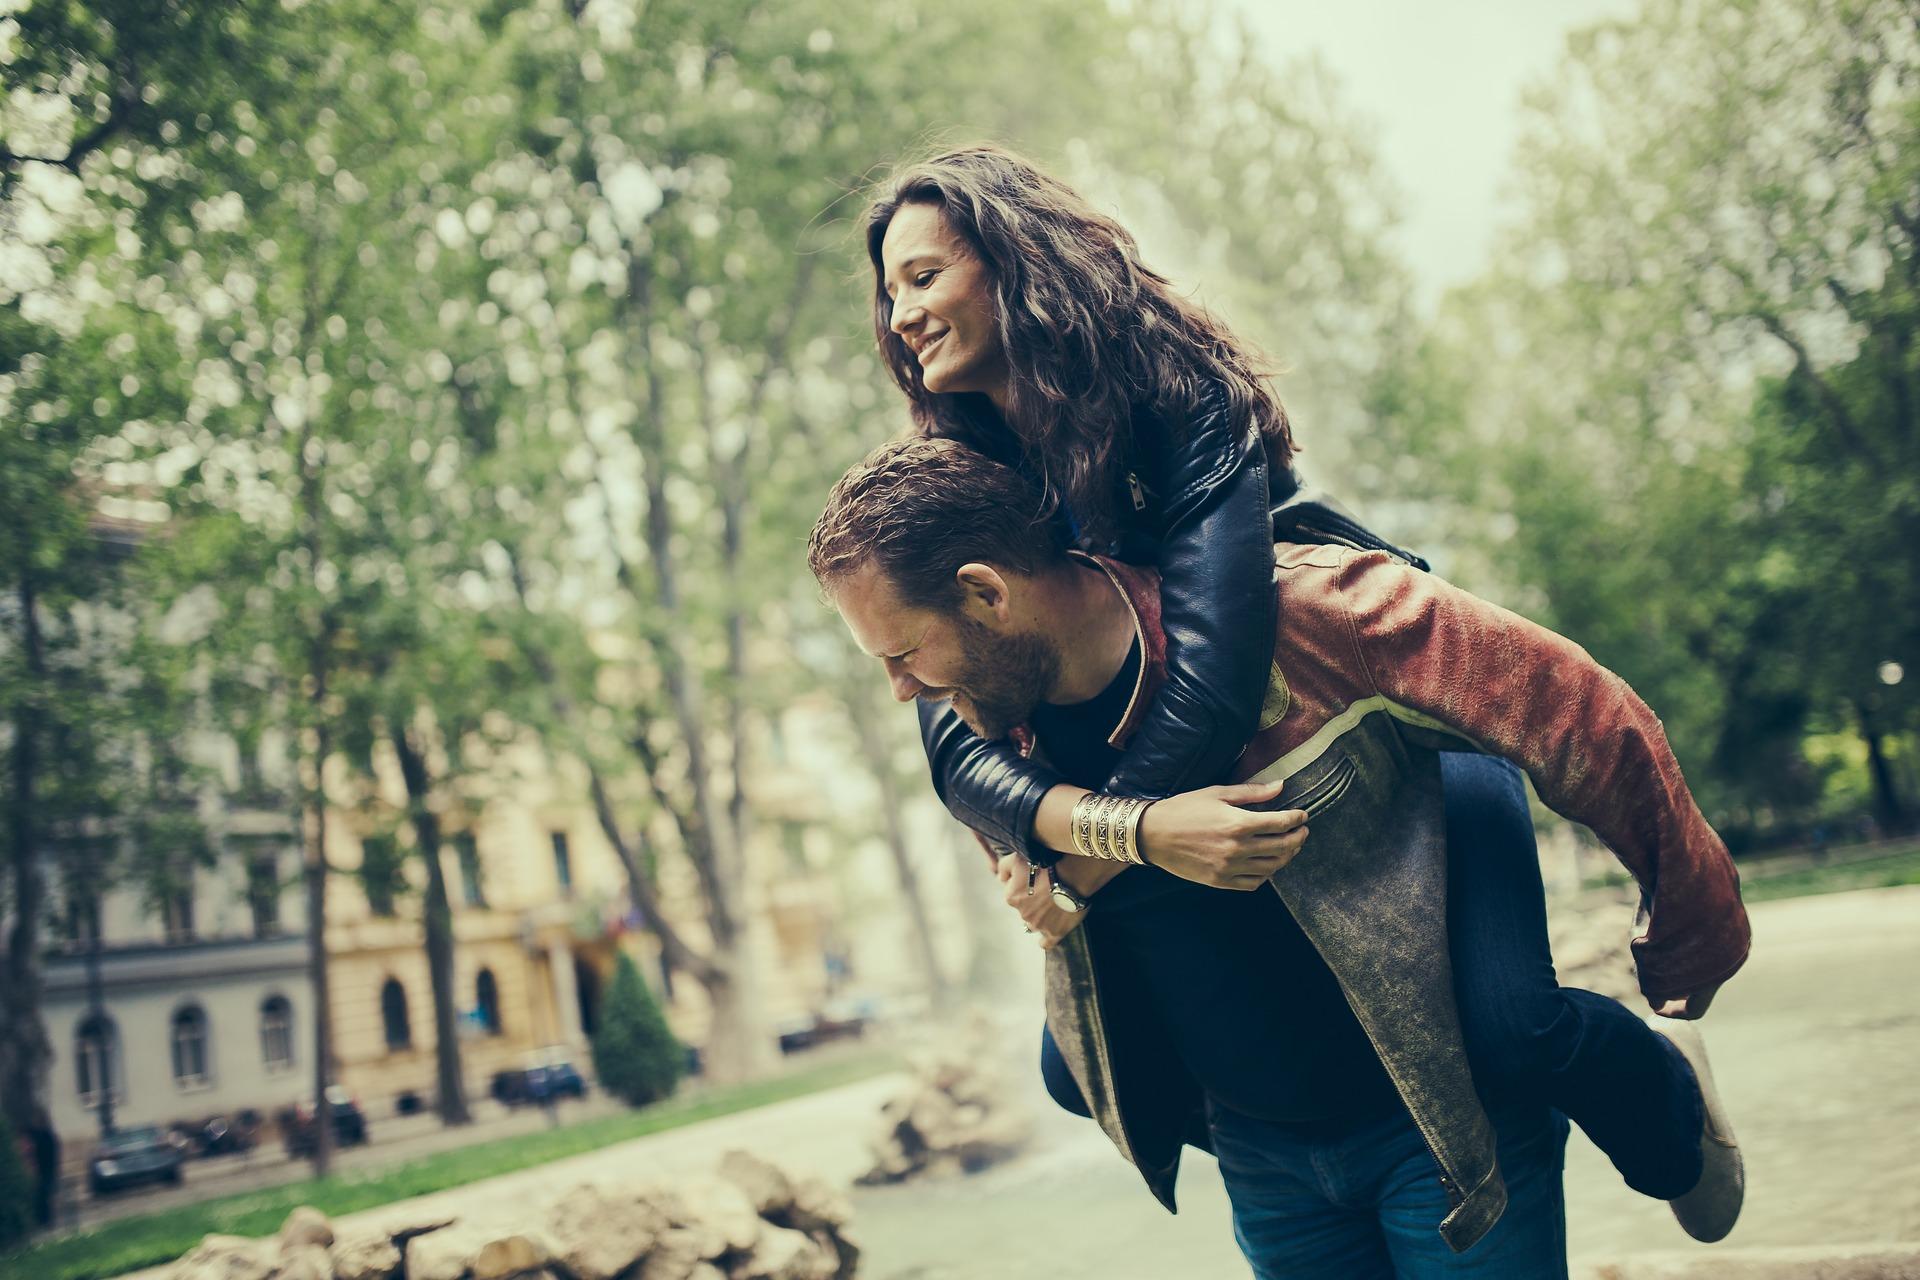 coppia strada felici